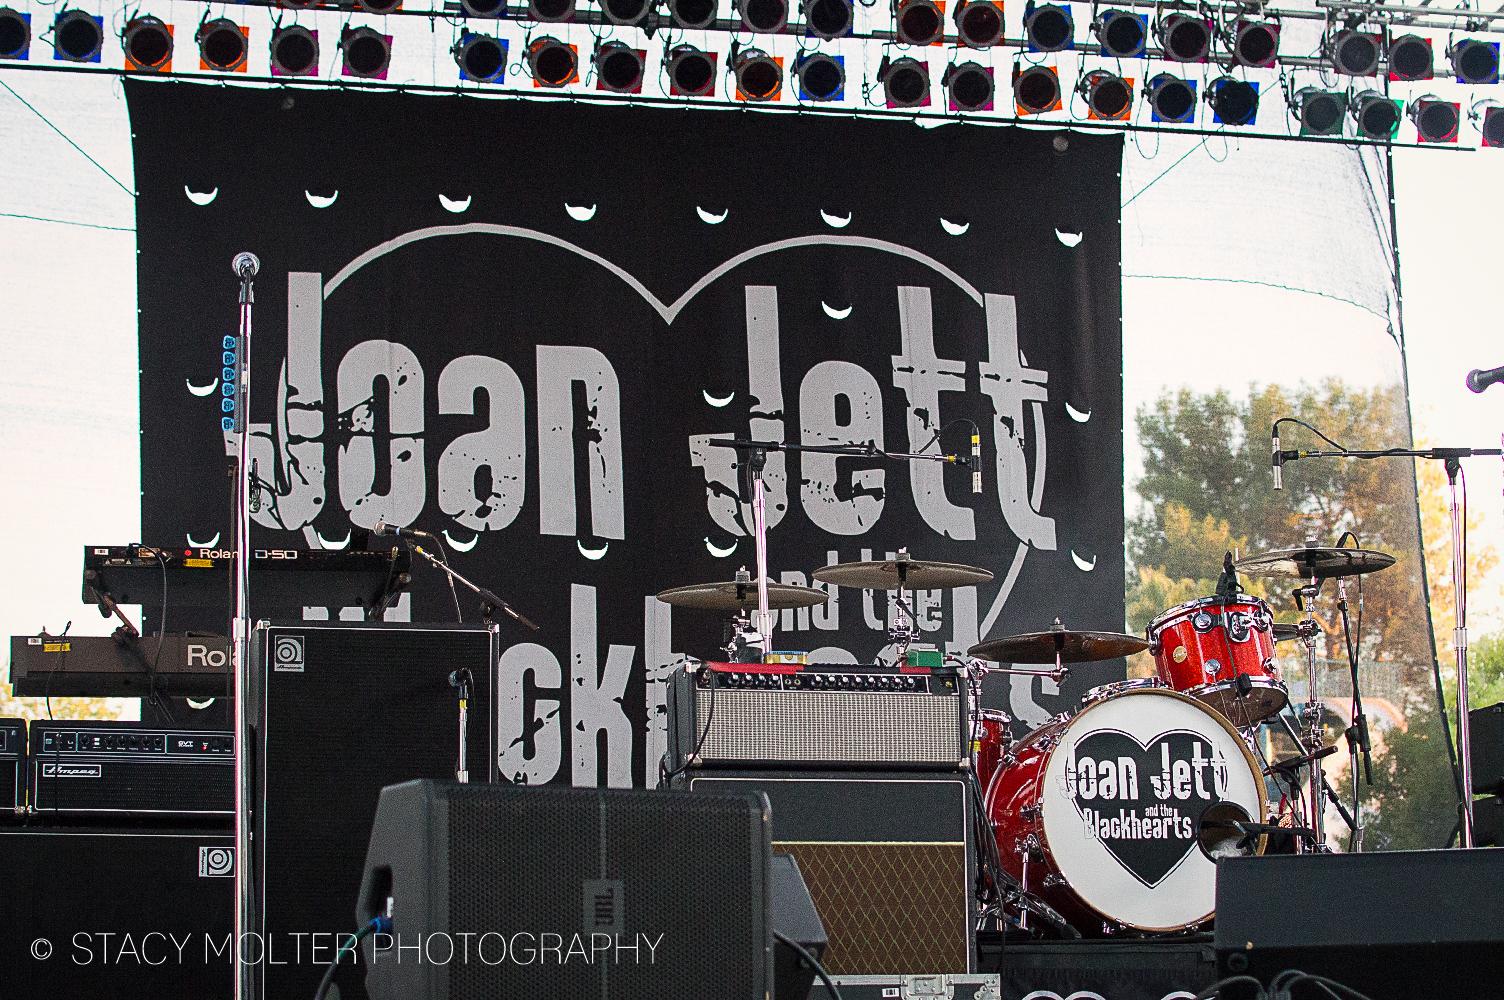 Joan Jett - State Fair California 2014 #StateFairCA #ItsTheBest #TheBest